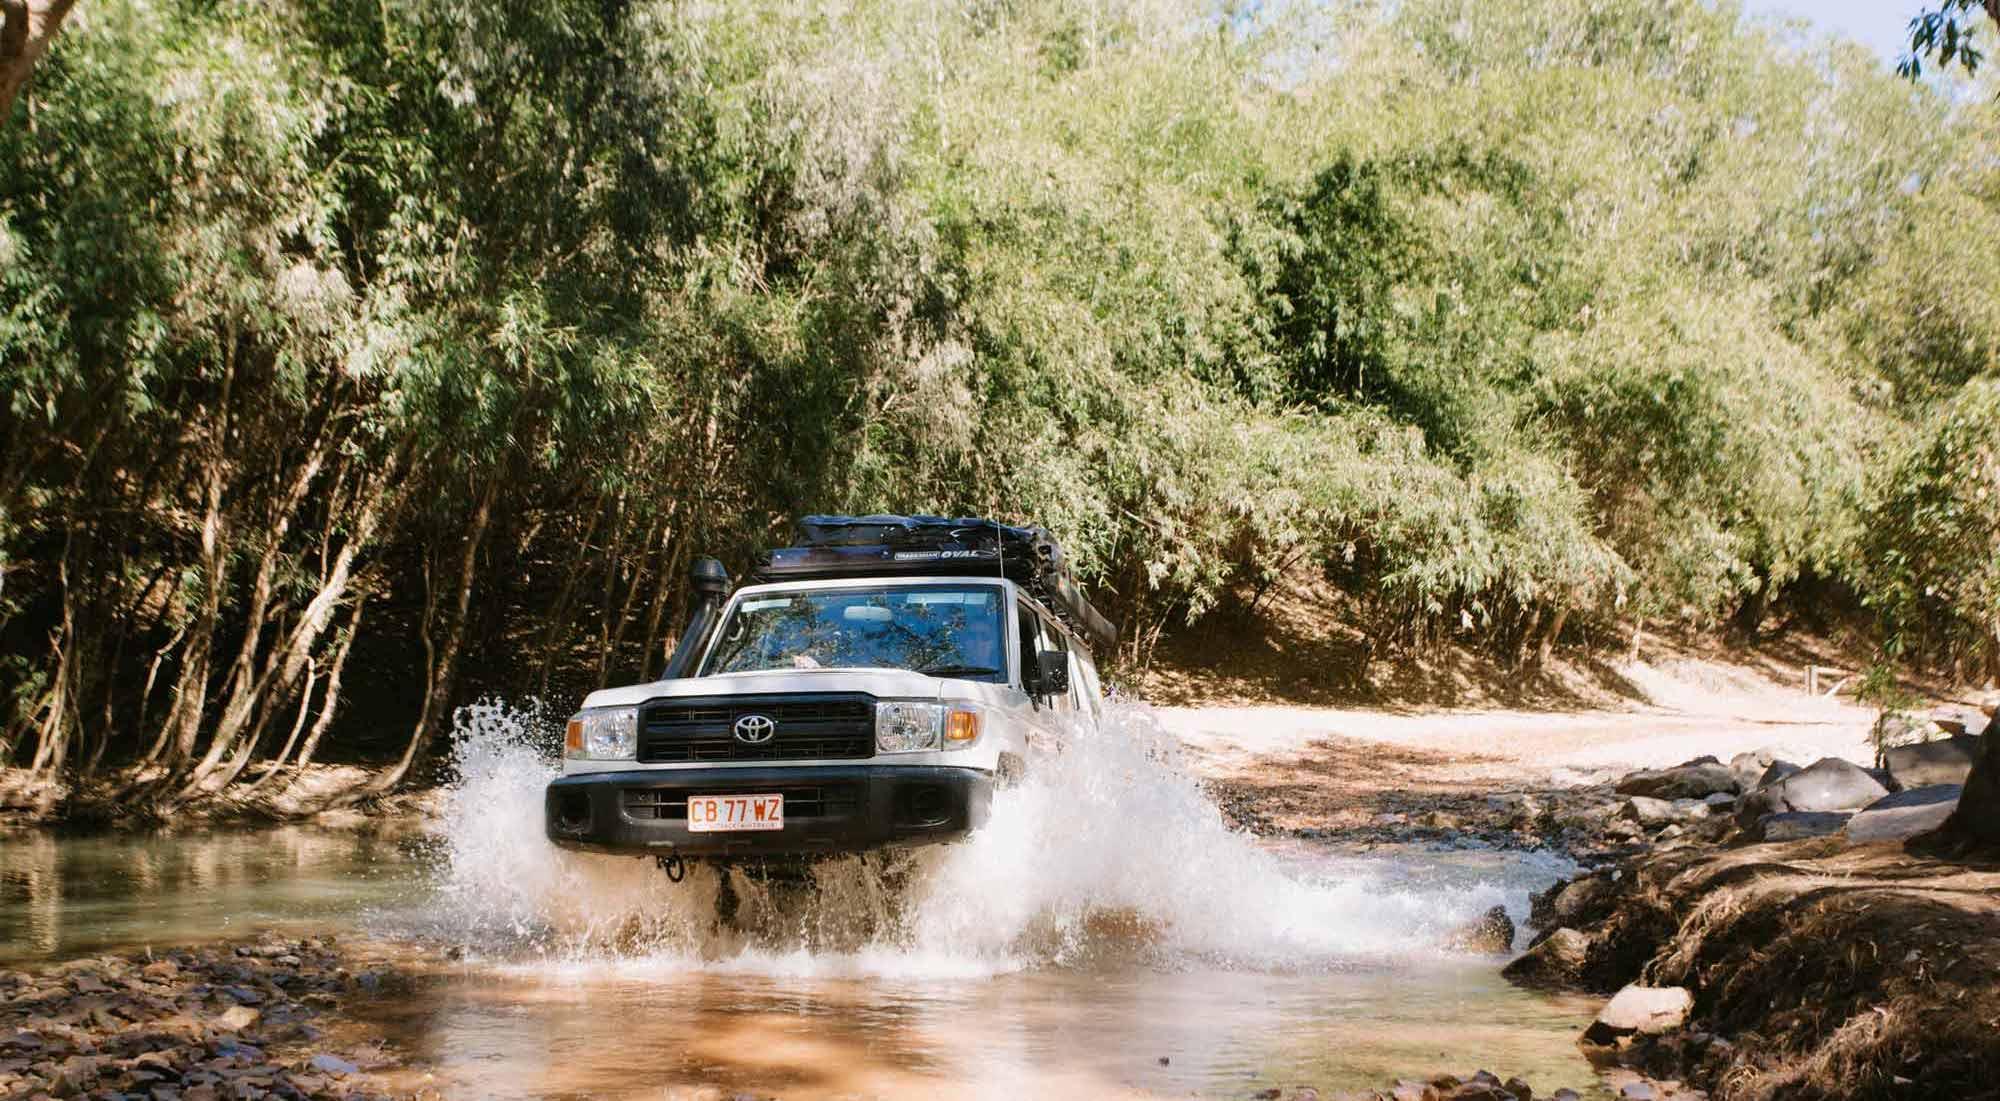 Britz Safari Landcruiser  4WD Watercrossing